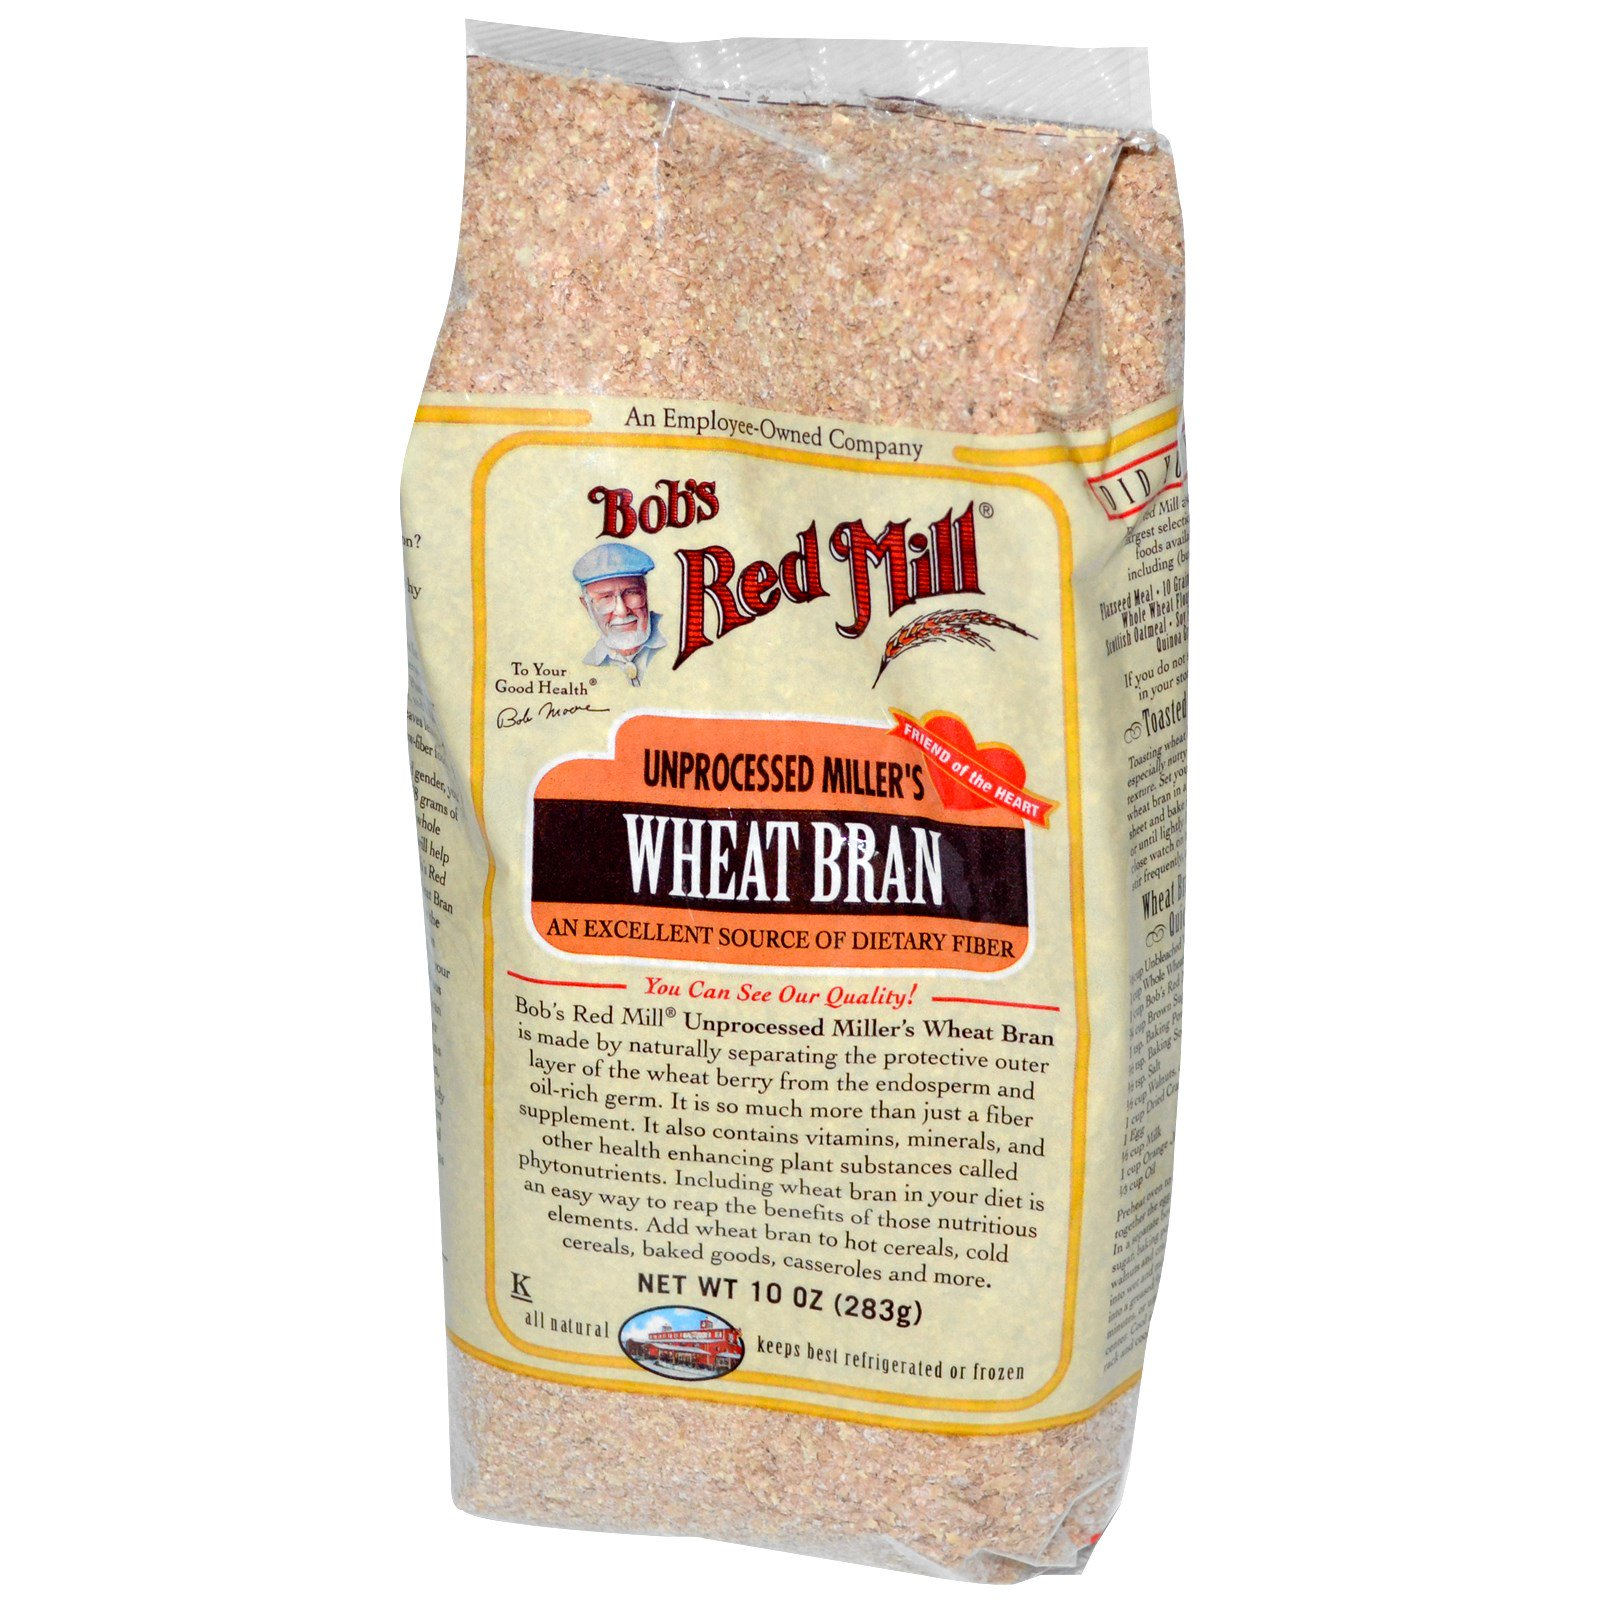 Bob's Red Mill, Unprocessed Miller's Wheat Bran, 10 oz (283